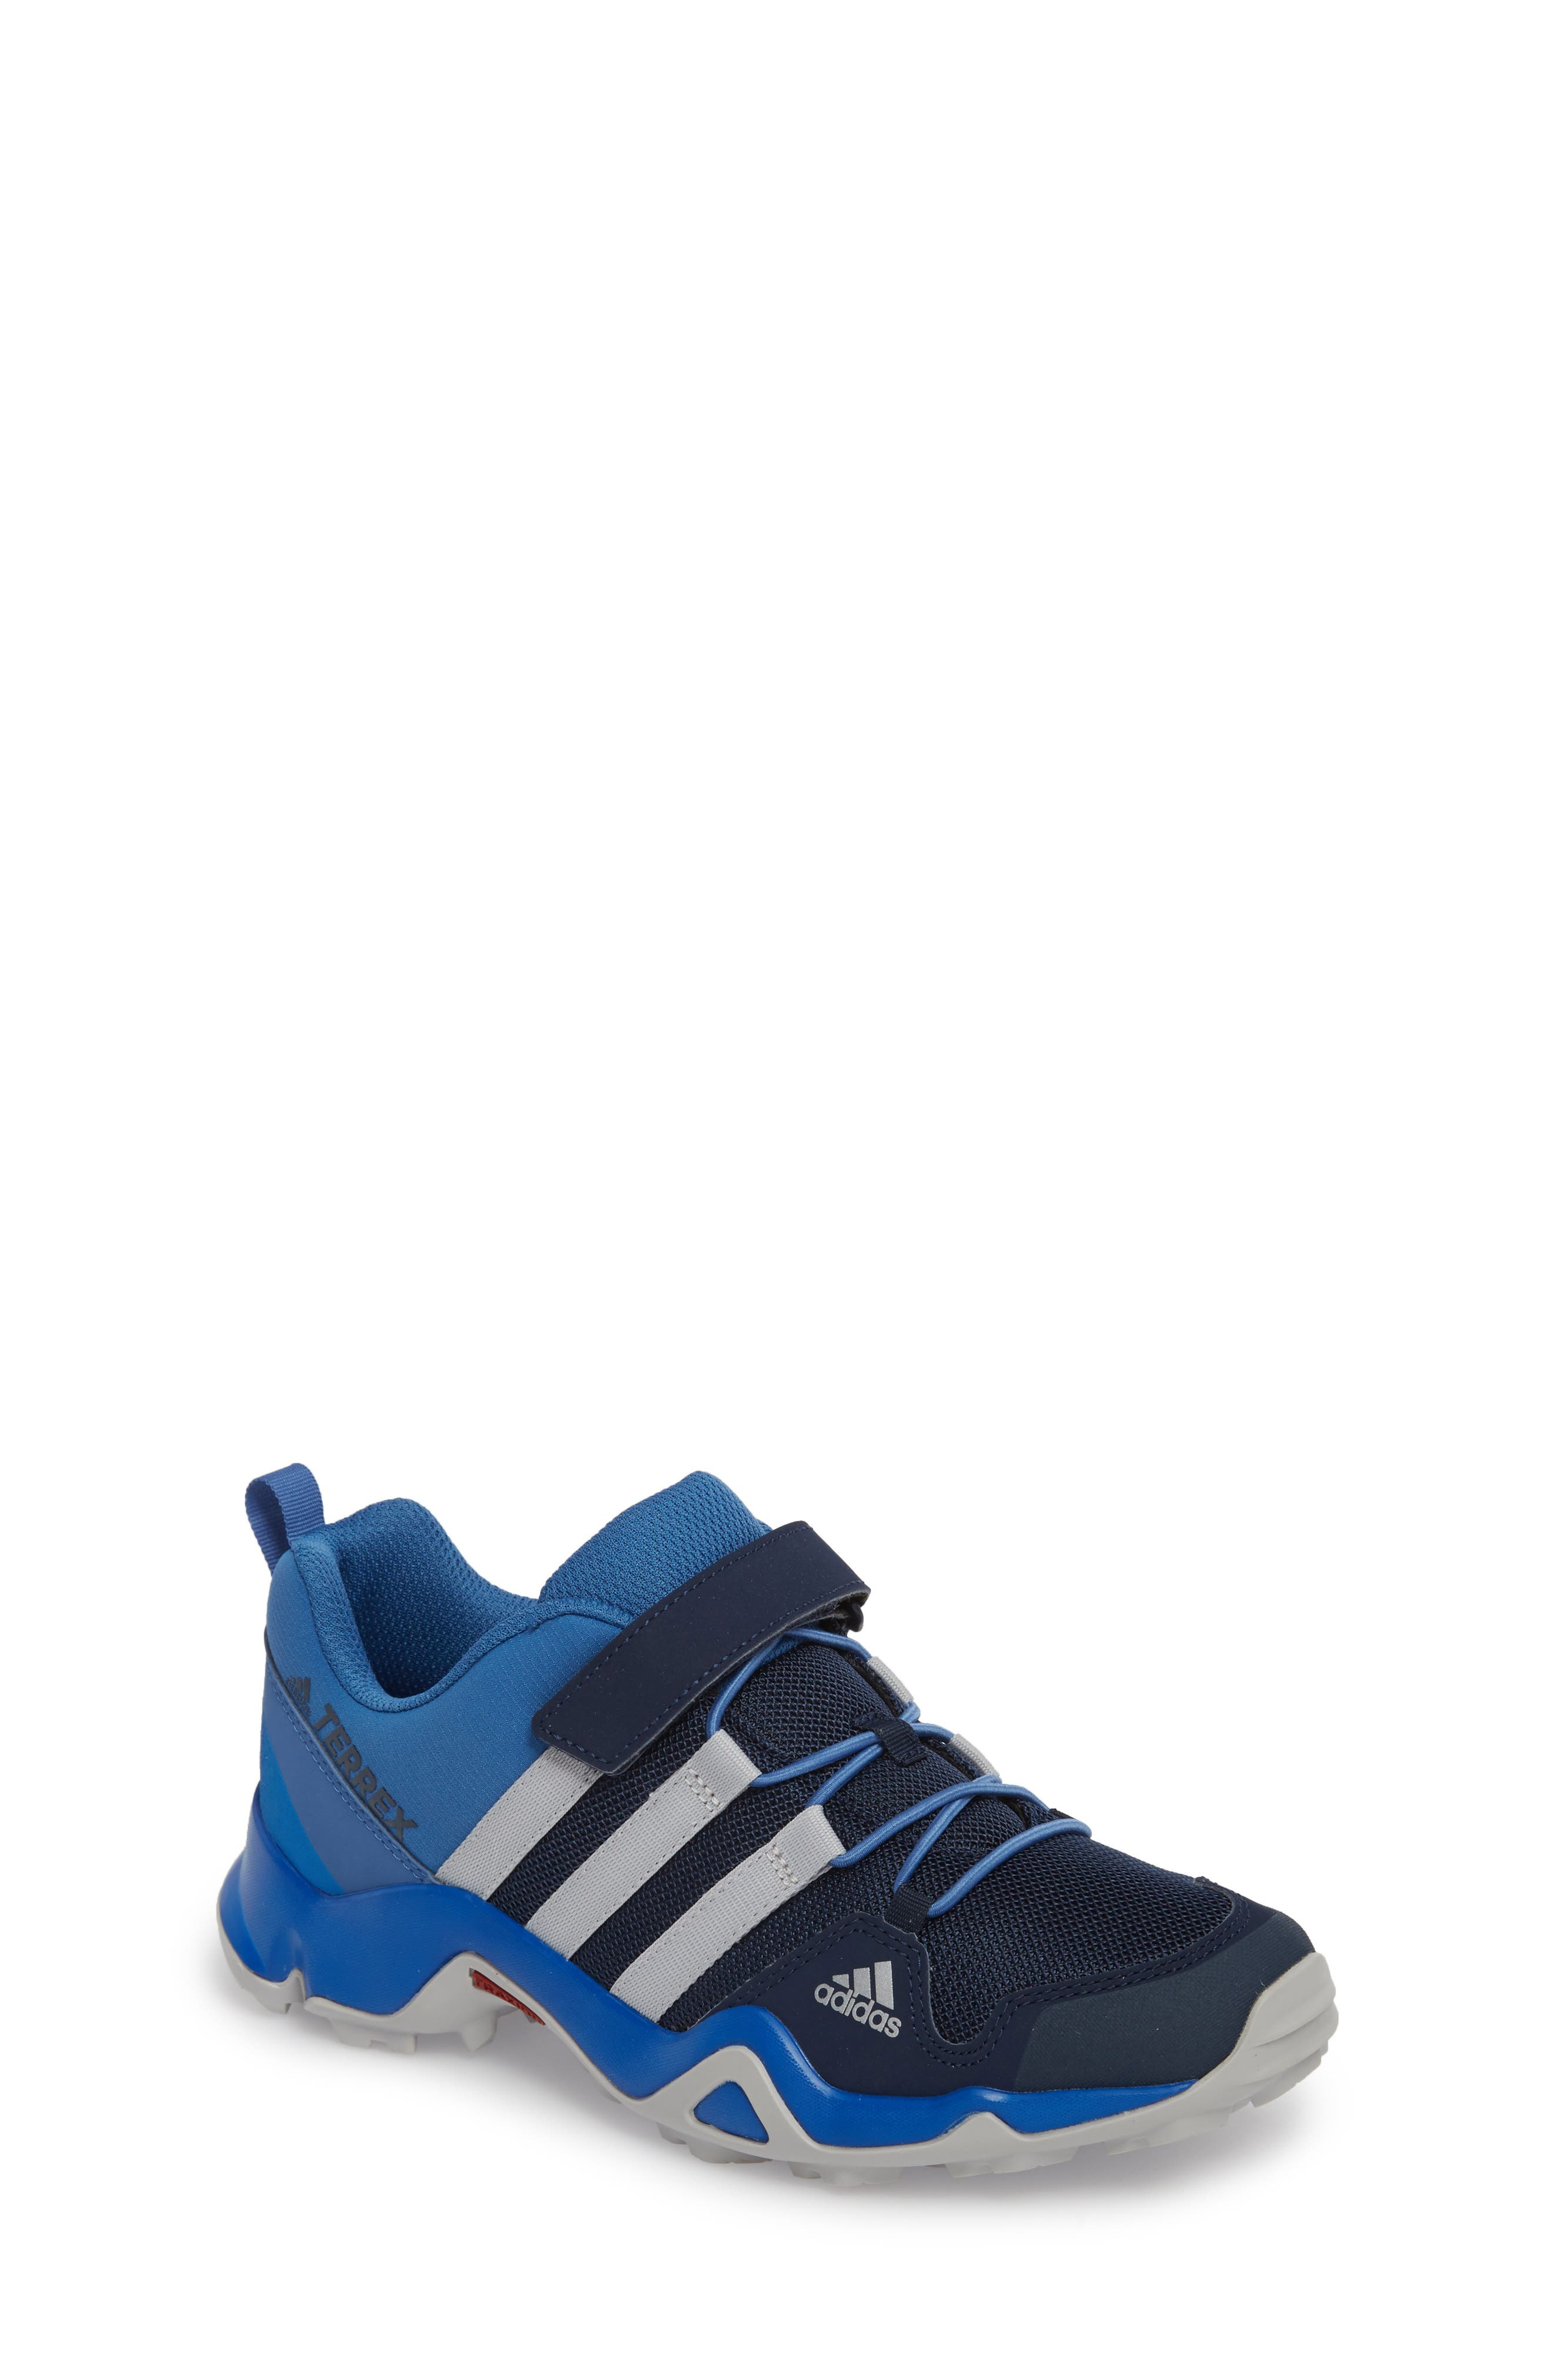 adidas Terrex AX2R Sneaker (Toddler, Little Kid & Big Kid)